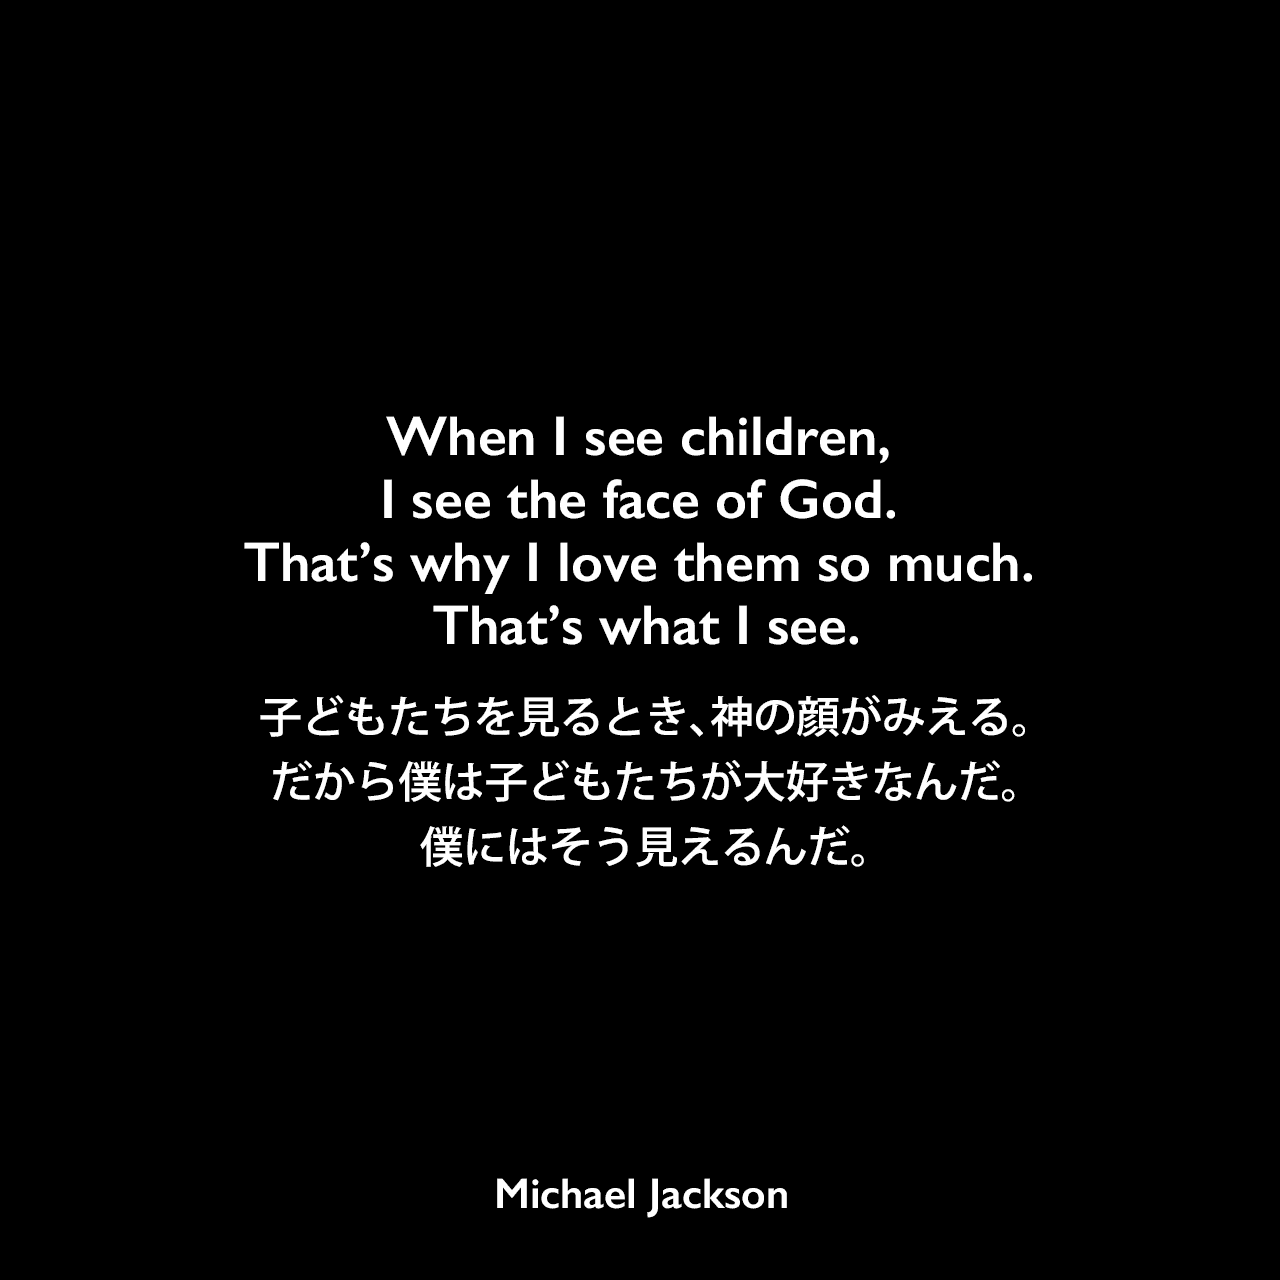 When I see children, I see the face of God. That's why I love them so much. That's what I see.子どもたちを見るとき、神の顔がみえる。だから僕は子どもたちが大好きなんだ。僕にはそう見えるんだ。Michael Jackson